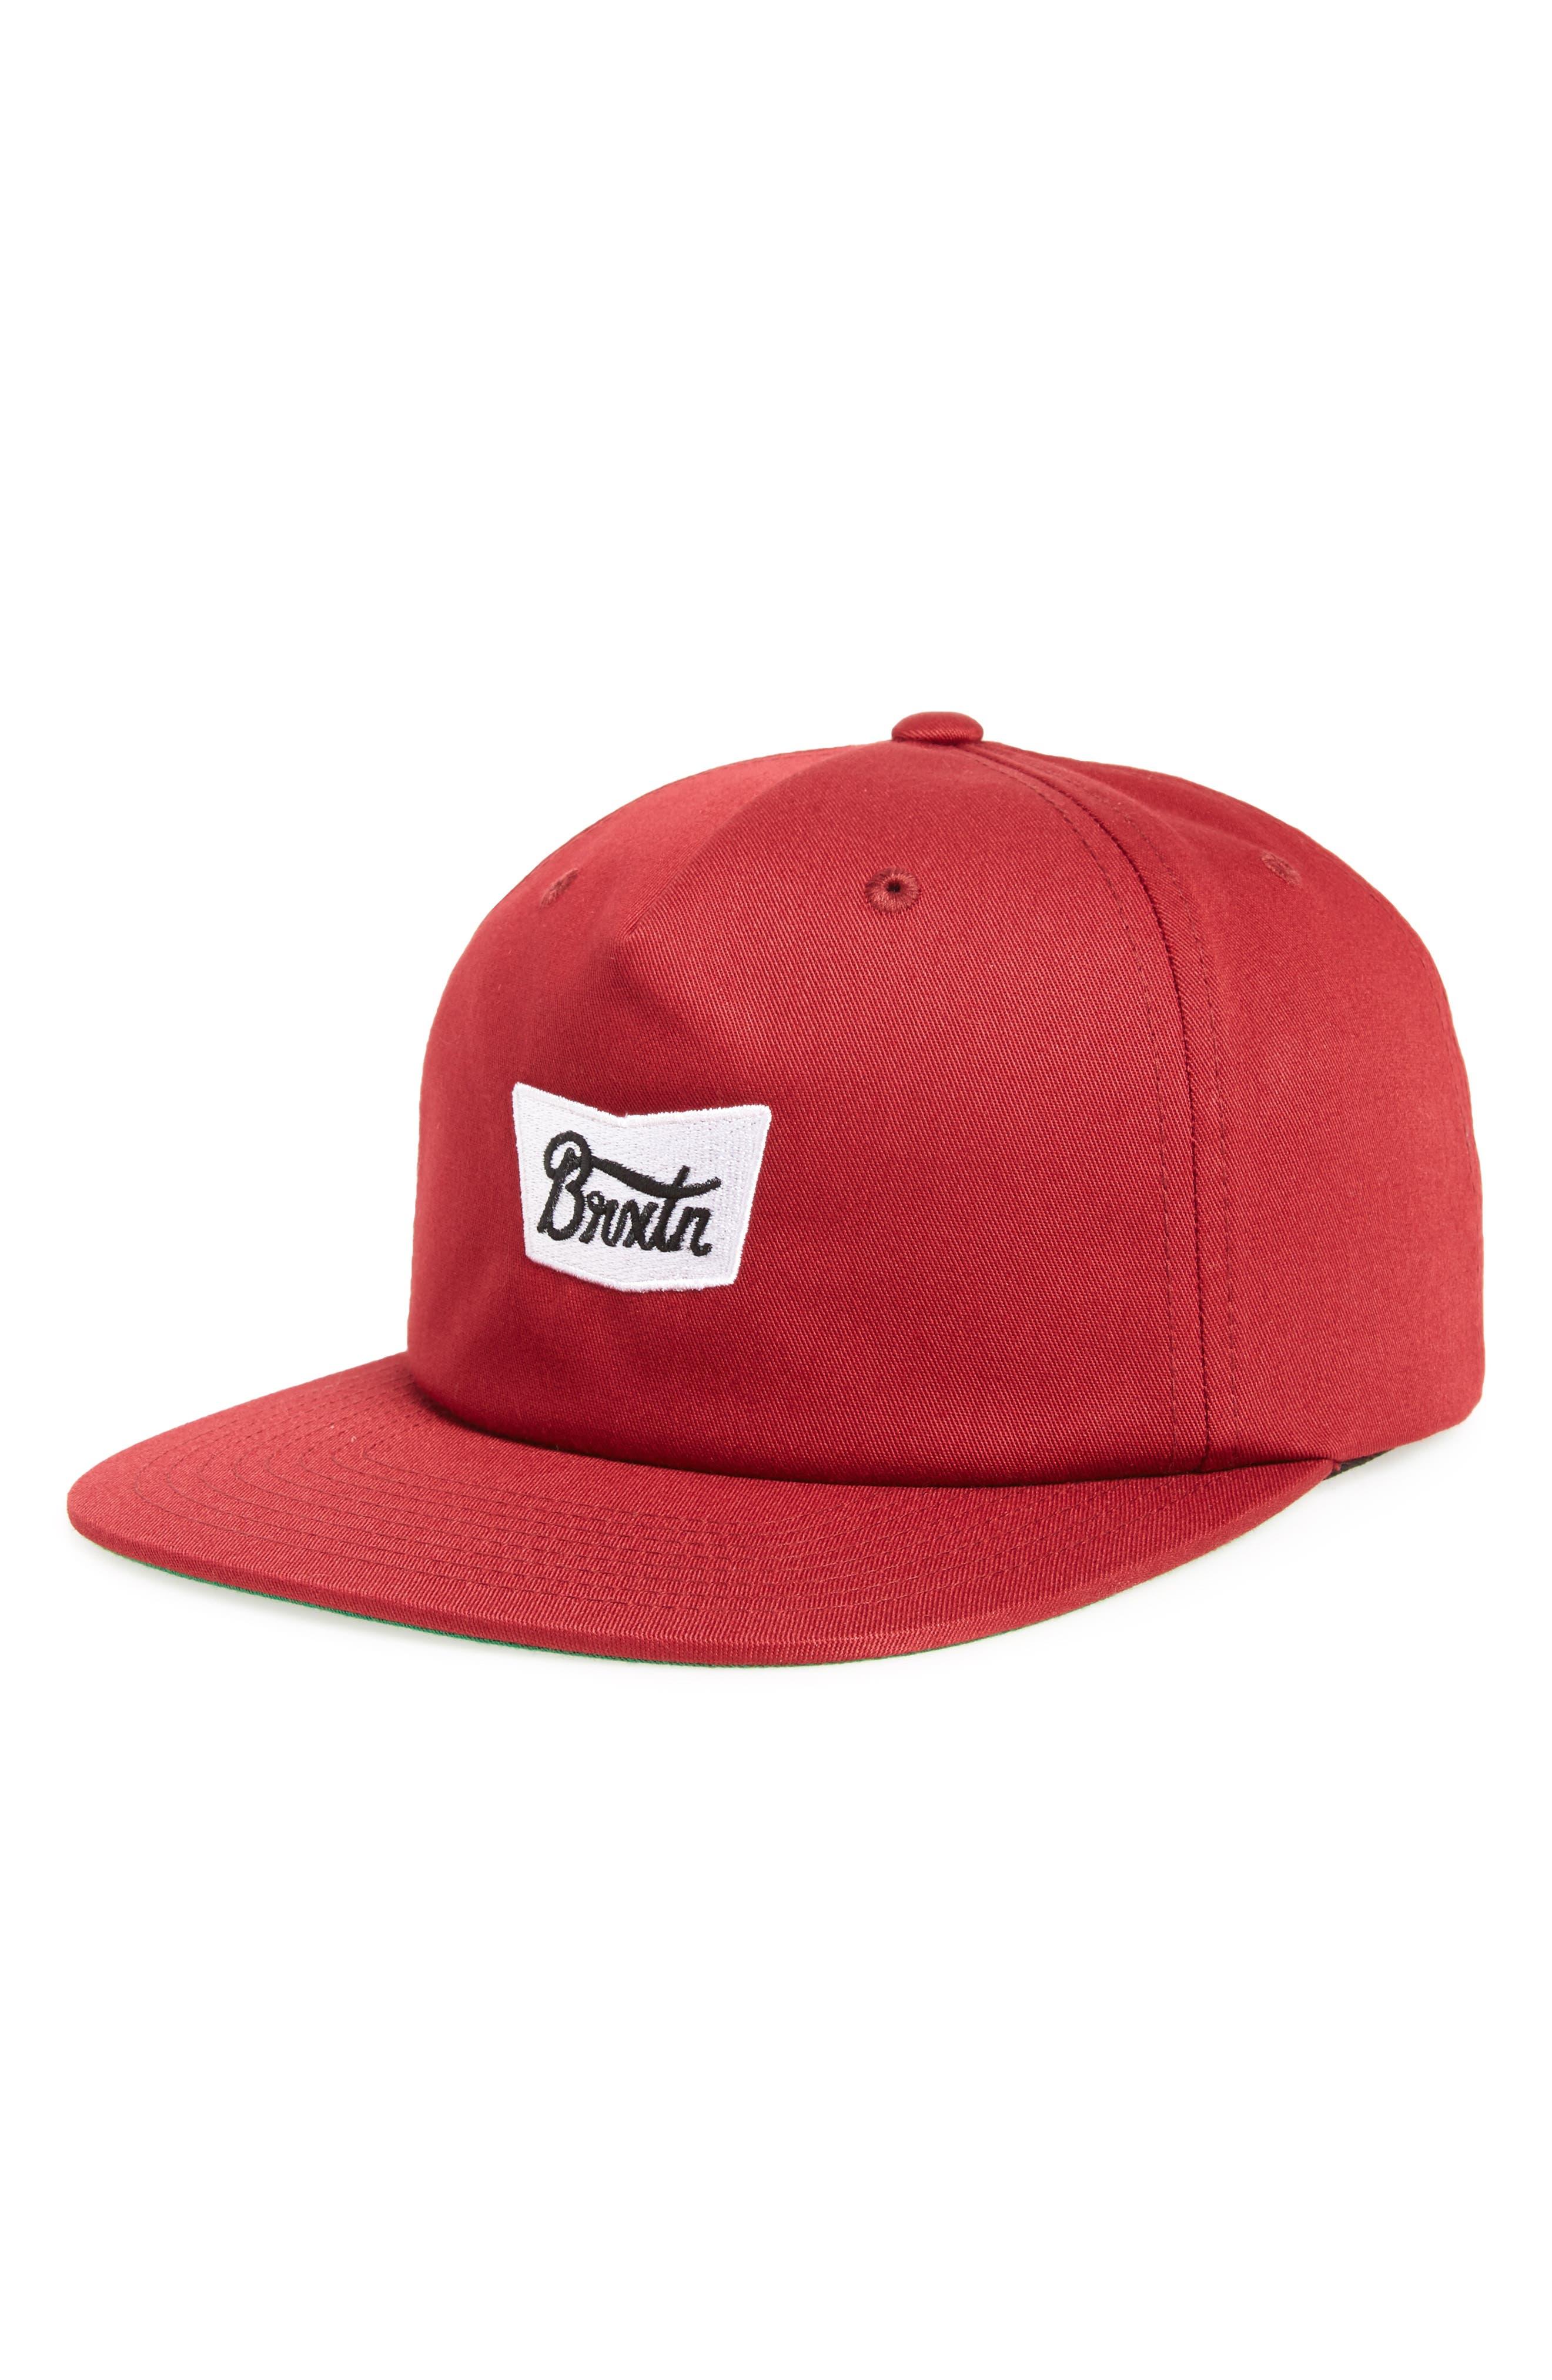 Snapback Baseball Cap,                         Main,                         color, Burgundy